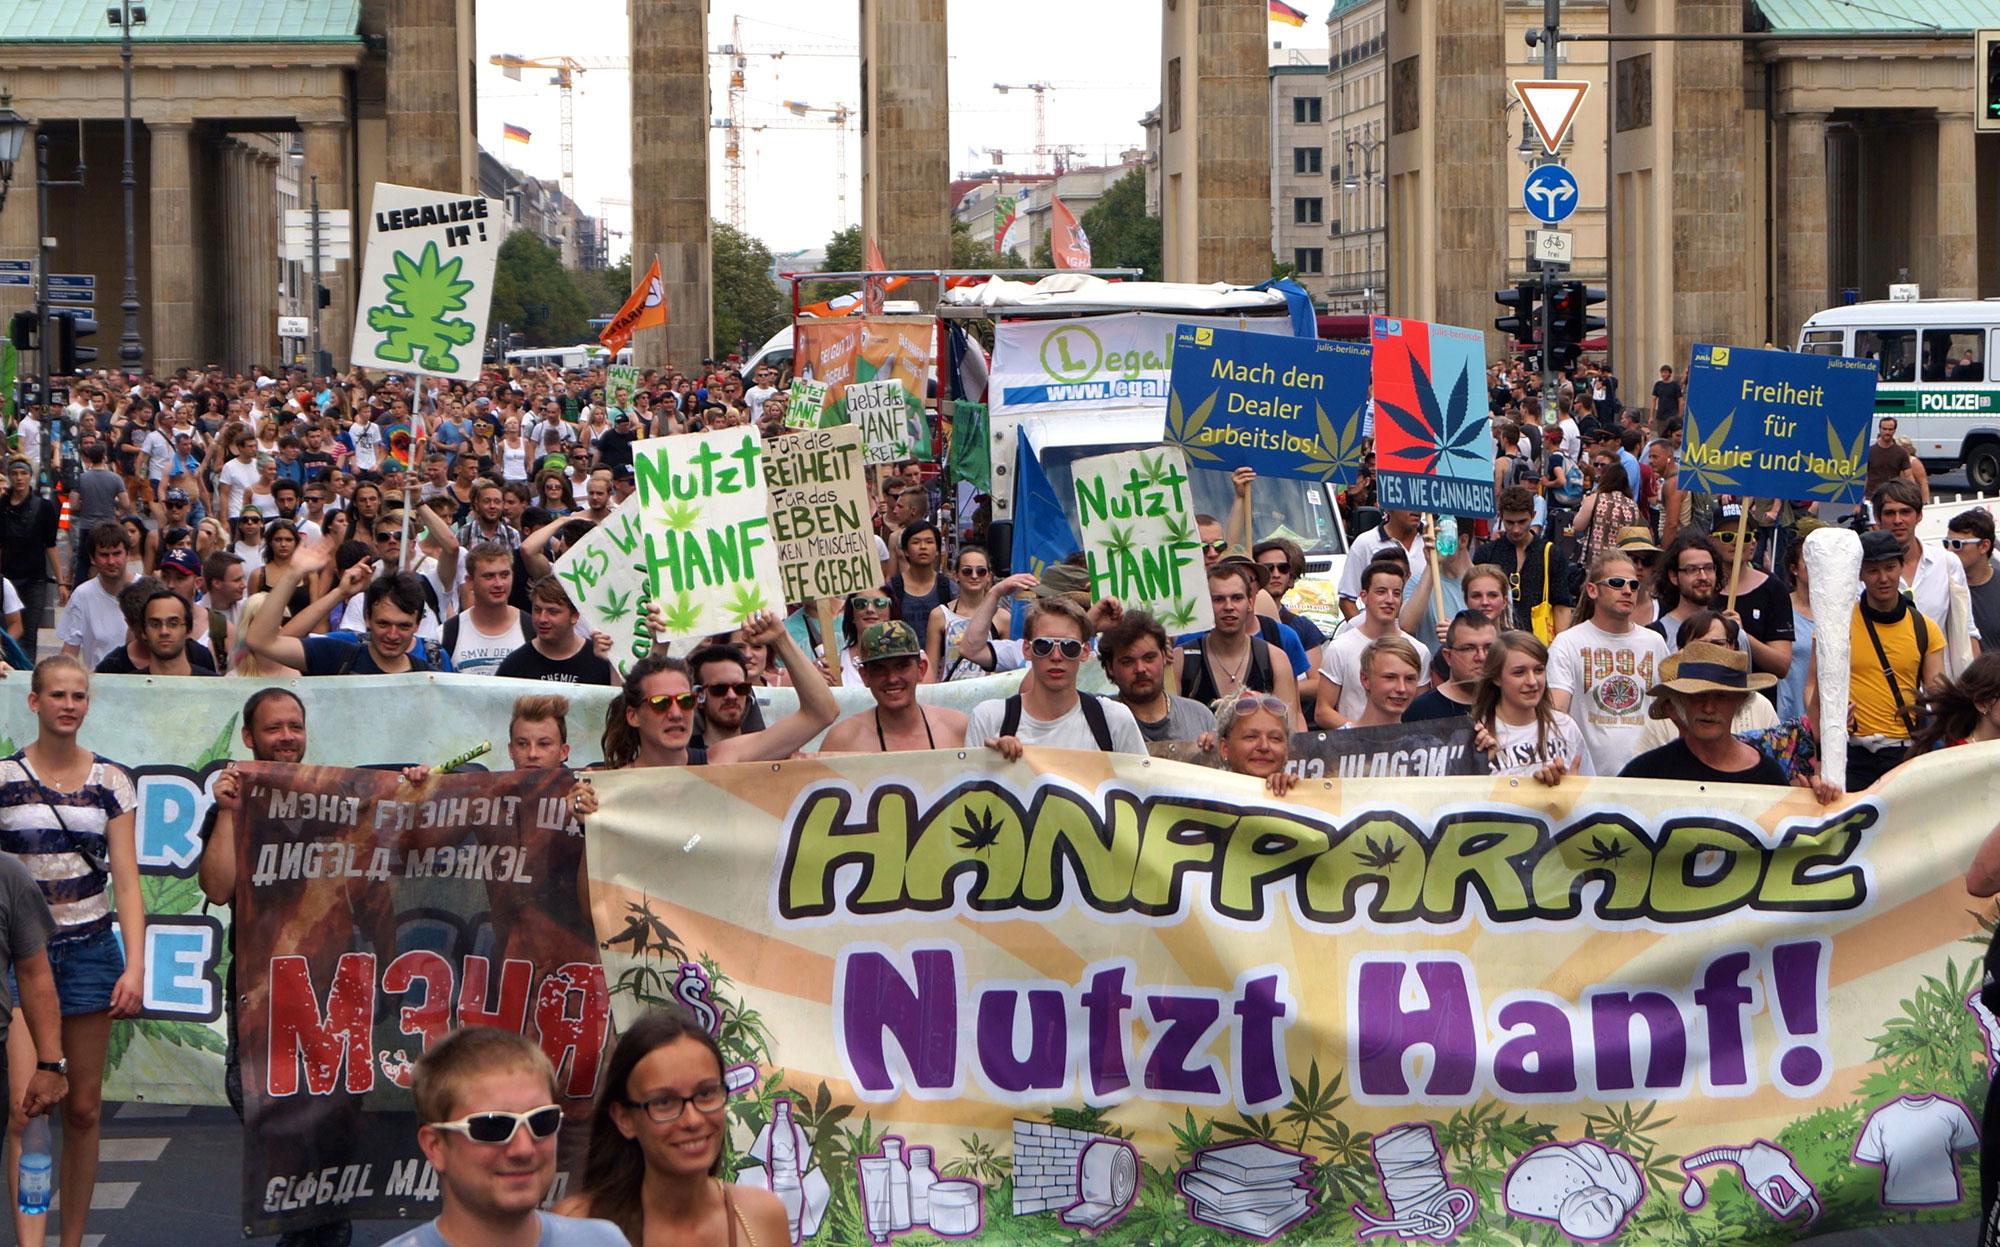 Hanfparade-2015-01